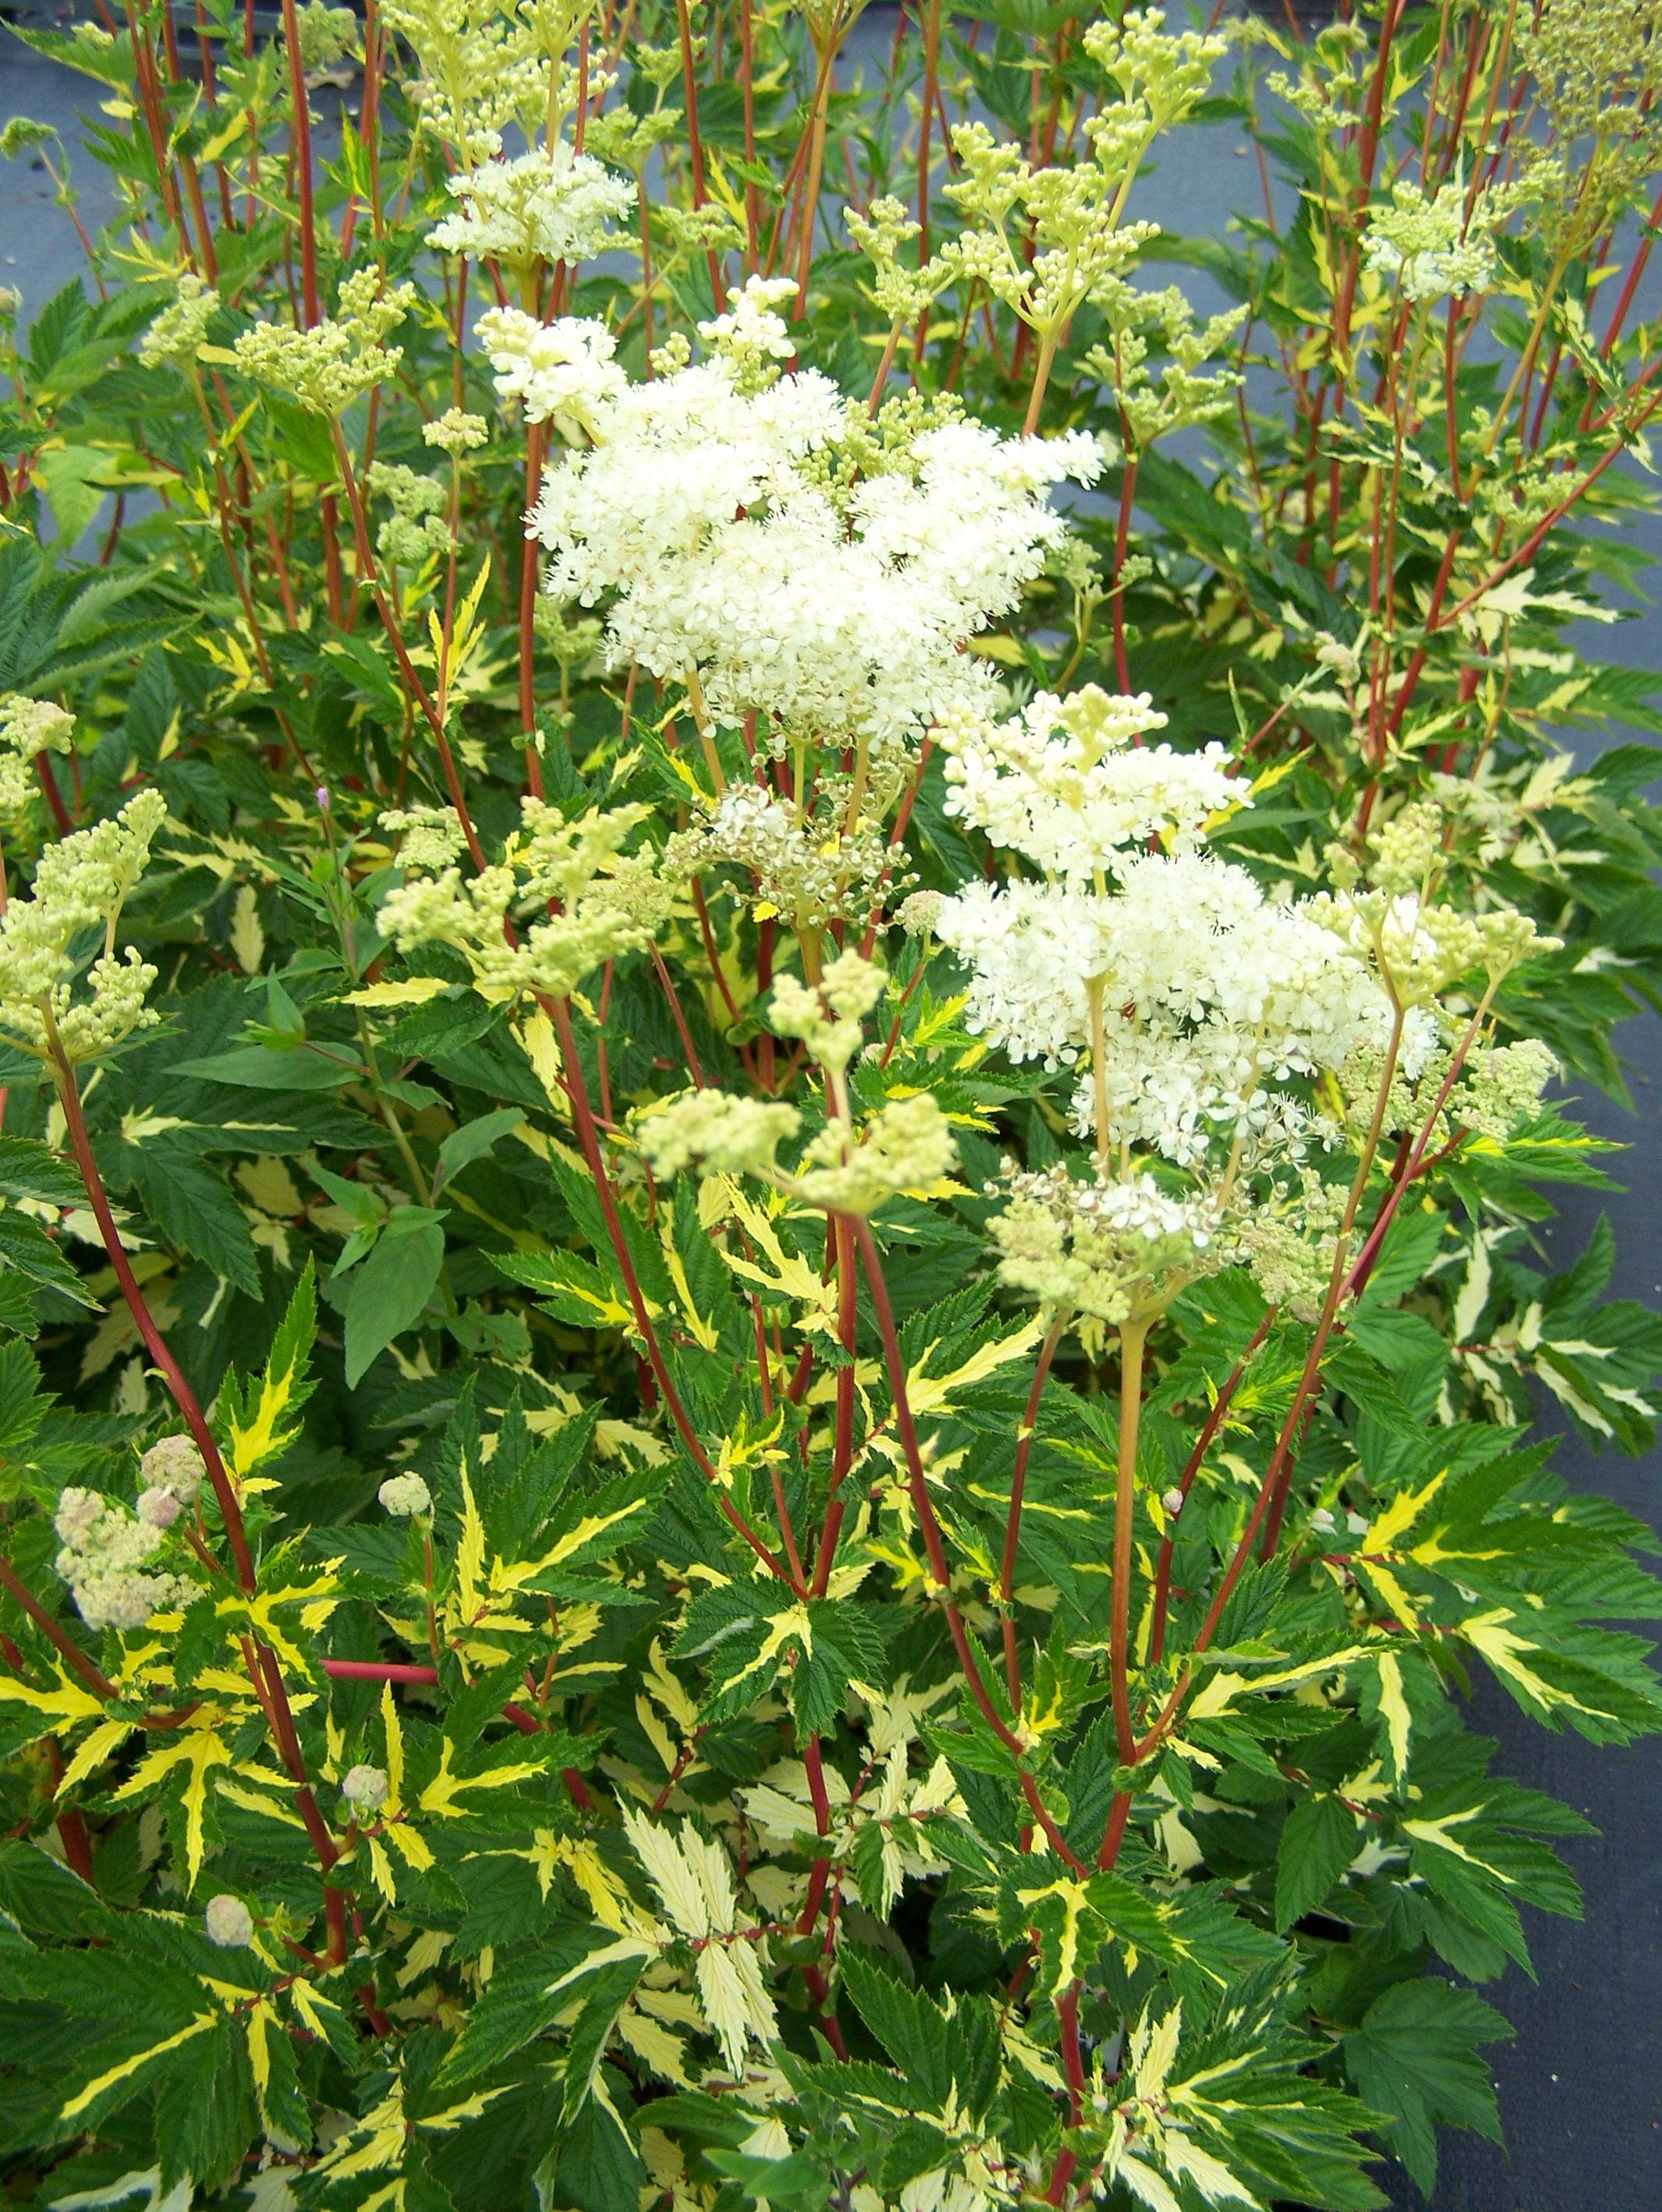 filipendula ulmaria variegata creamy white clusters of flowers